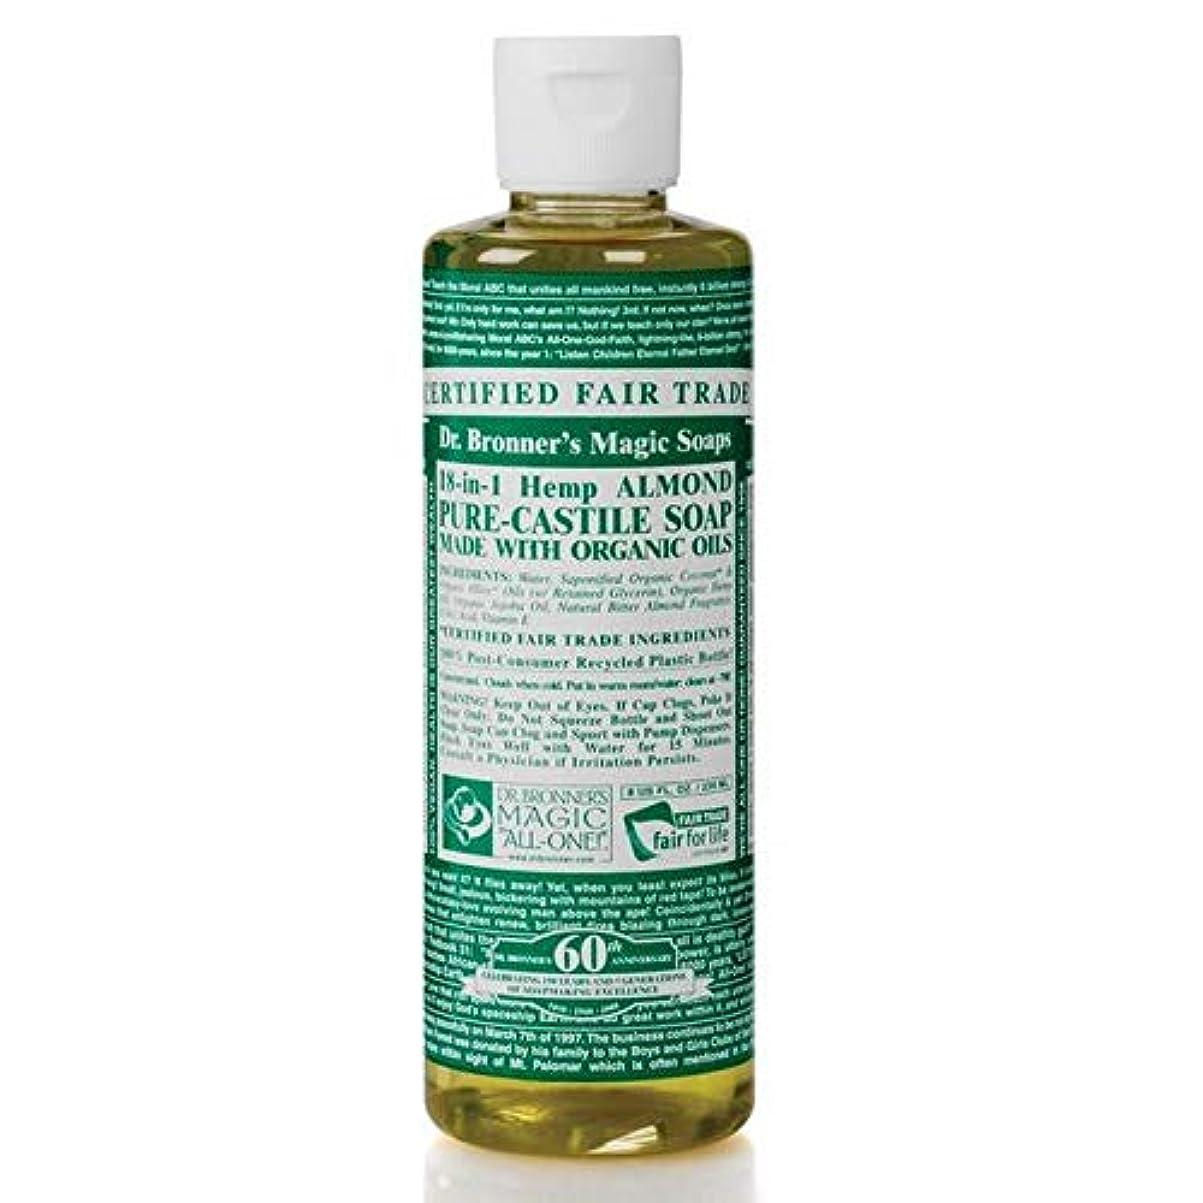 [Dr Bronner] Dr。ブロナーズ有機アーモンドカスティーリャ液体石鹸473ミリリットル - Dr. Bronner's Organic Almond Castile Liquid Soap 473ml [並行輸入品]